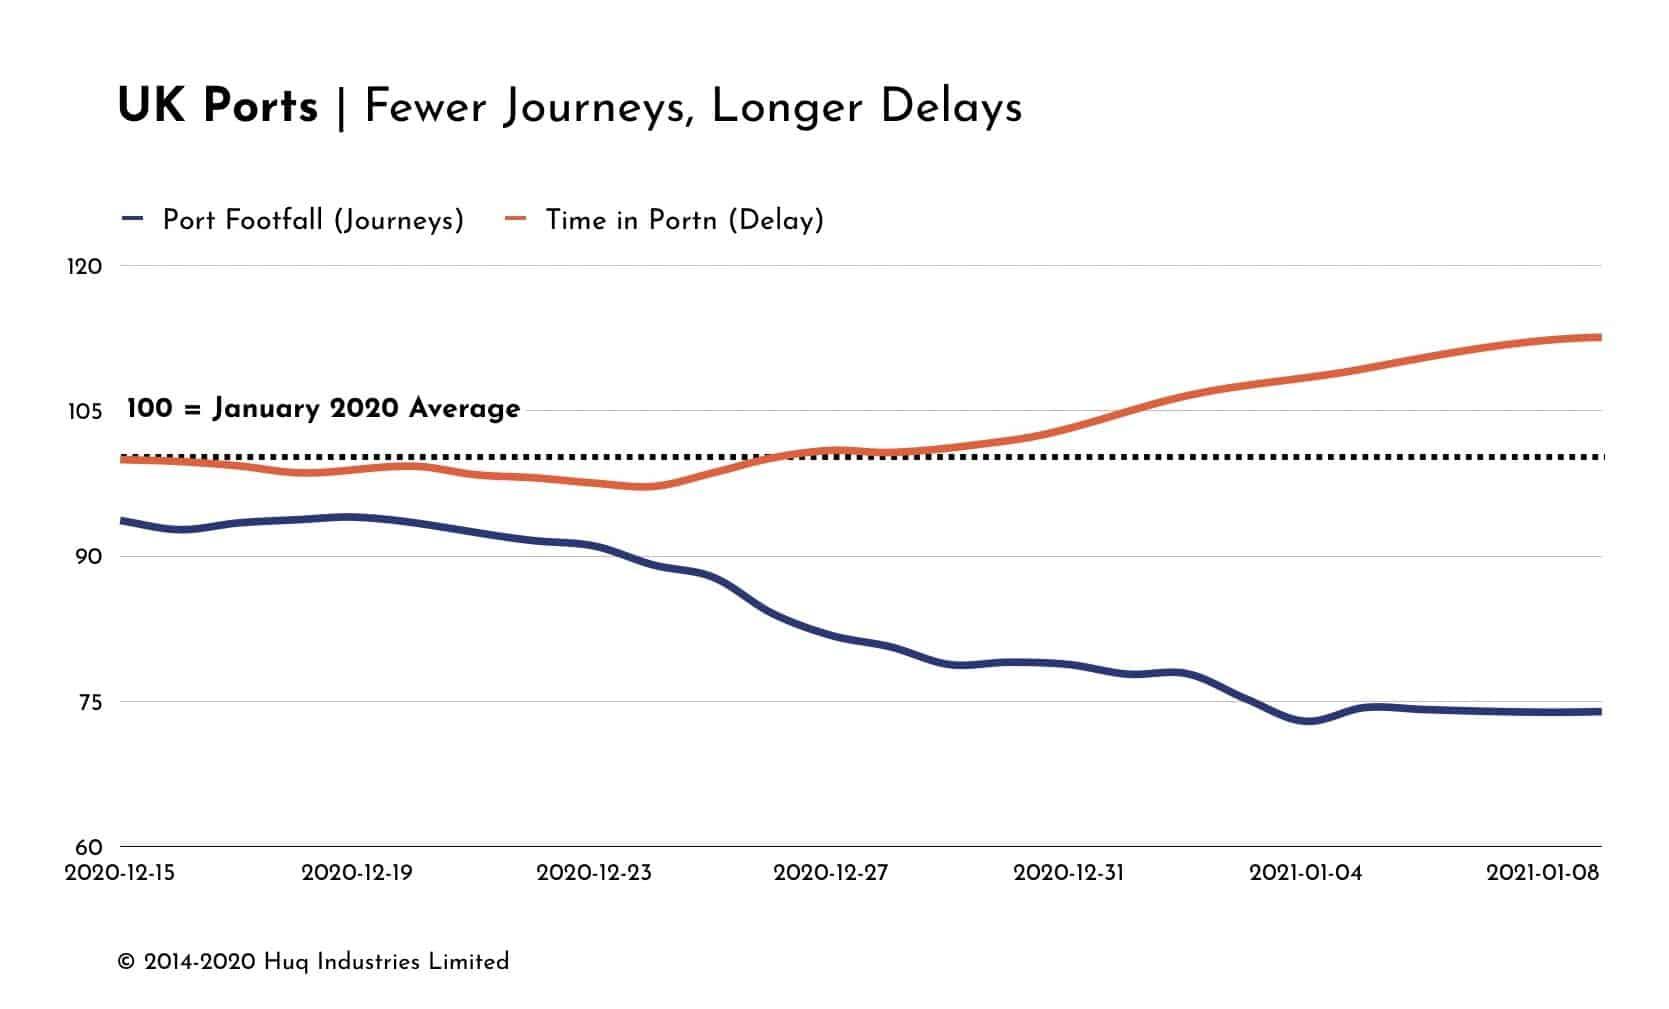 UK Ports Delays & Transits